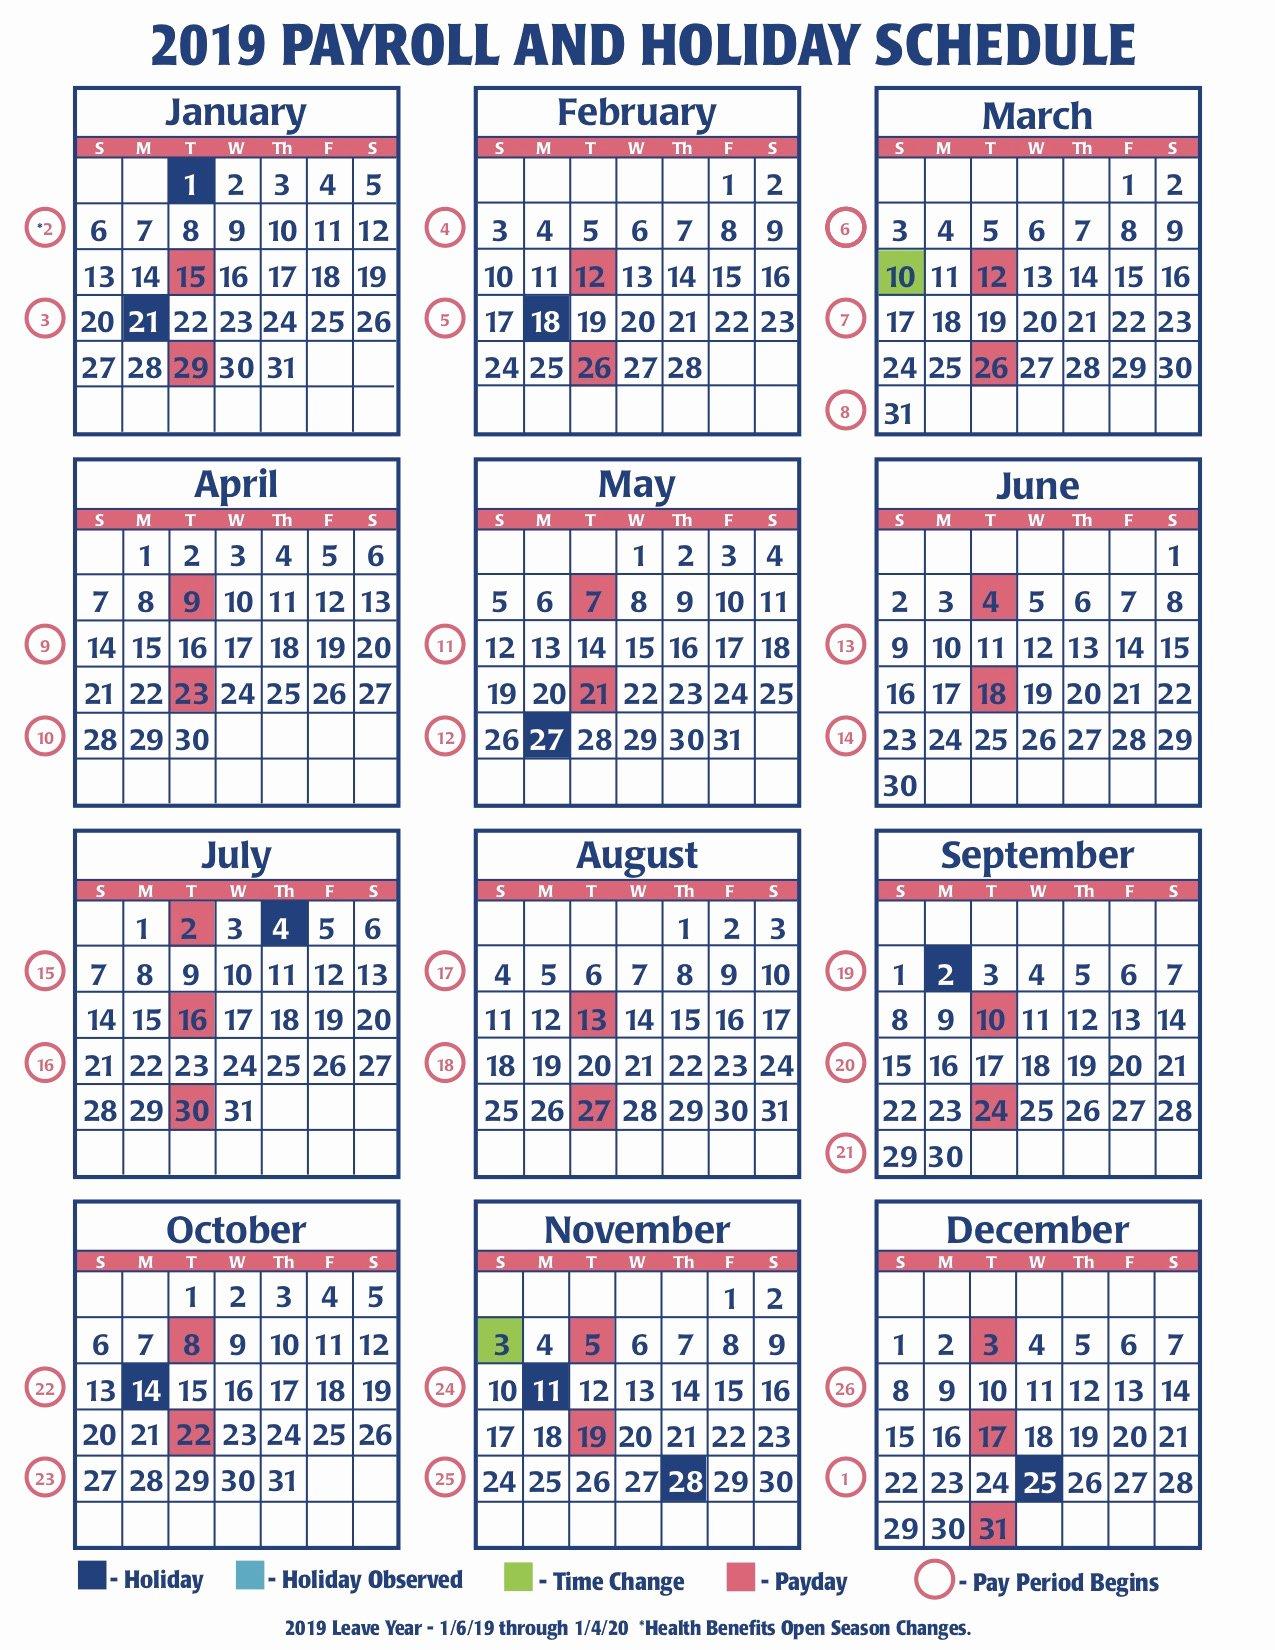 2019 Biweekly Payroll Calendar Template New Weekly Payroll Calendar for 2019